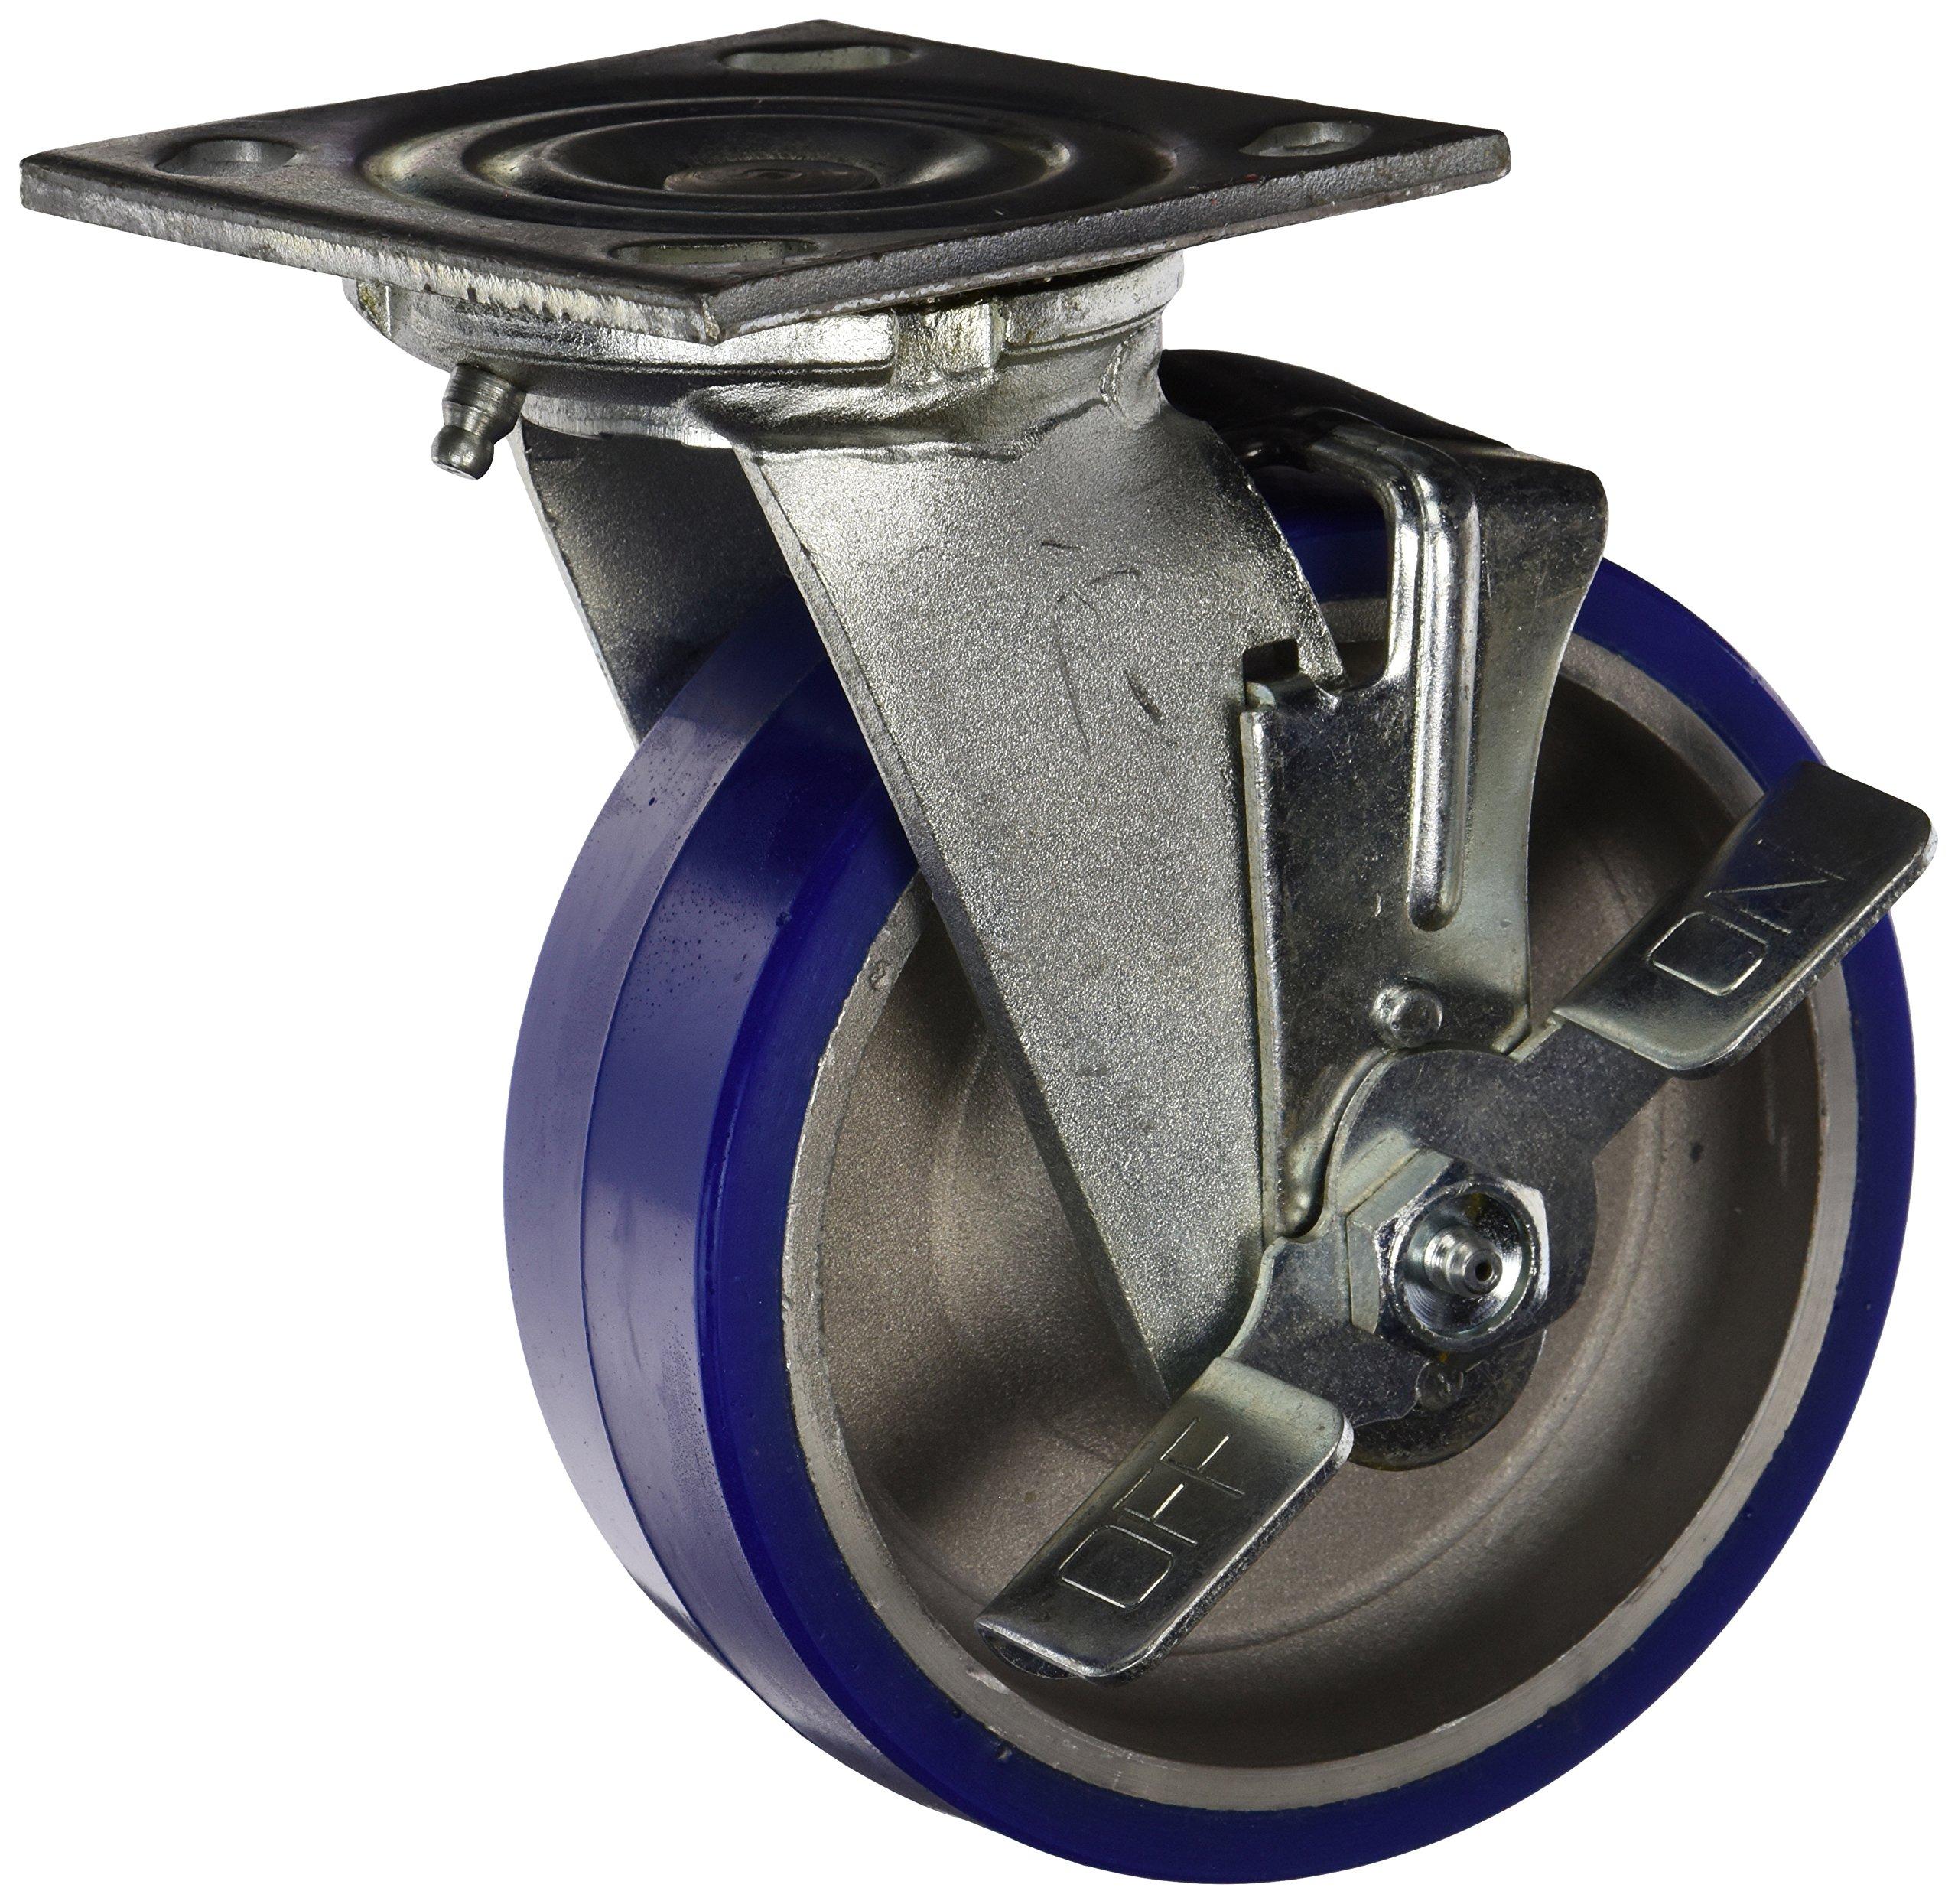 Jarvis 6-81-720 BRK PLT1 Swivel Plate Caster with Brake, 1000-Lbs. Capacity, Moldon Polyurethane/Aluminum Core, Bright Zinc Plating